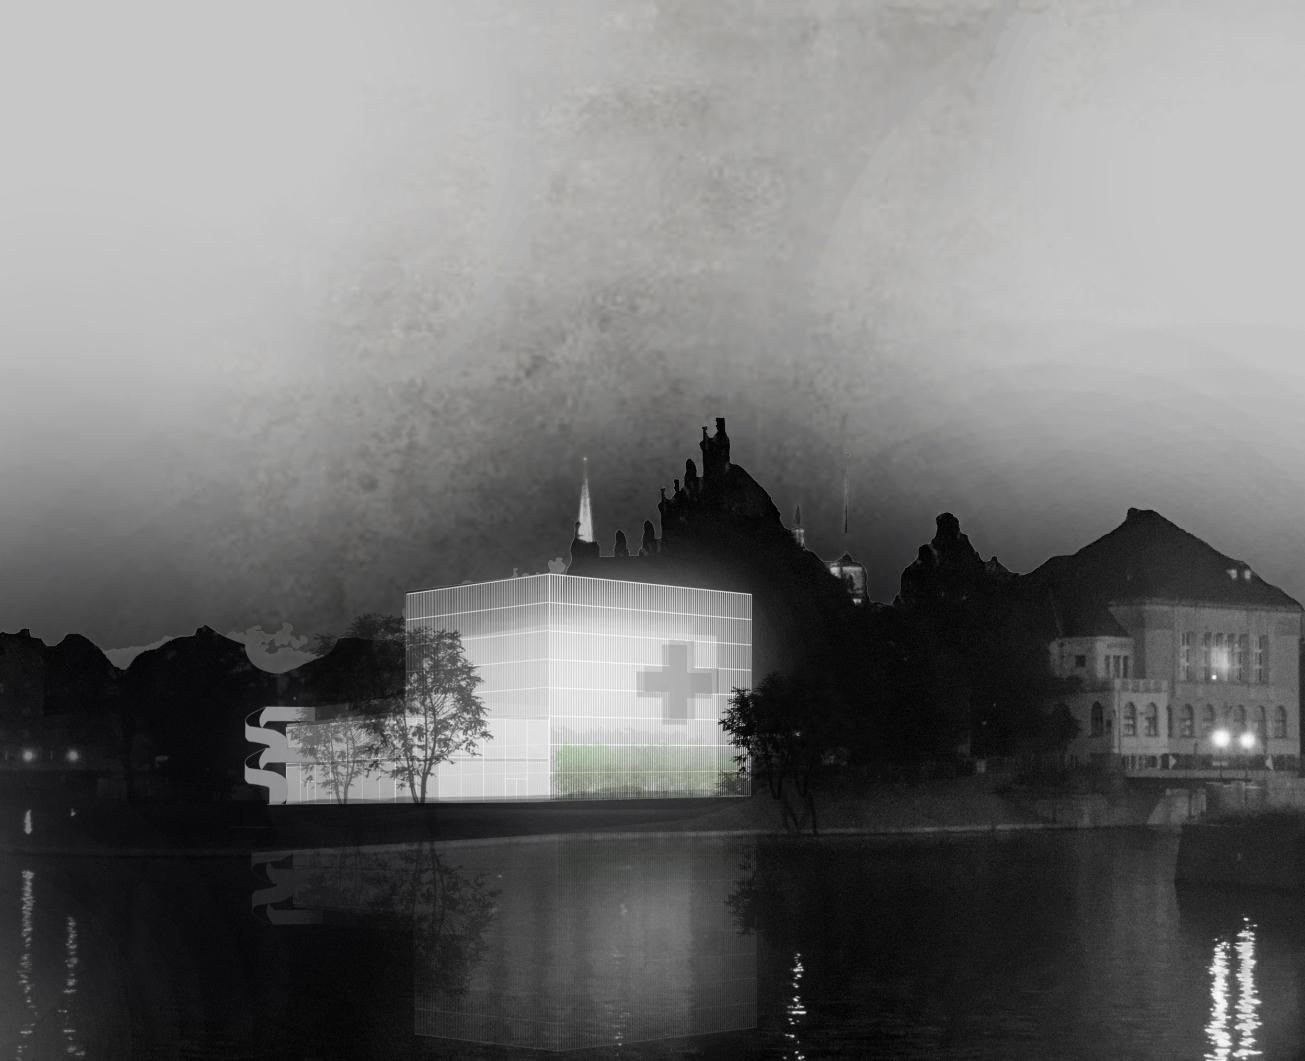 9_elzbieta-komendacka_wroclaw-univeristy-of-technology_architecture_master